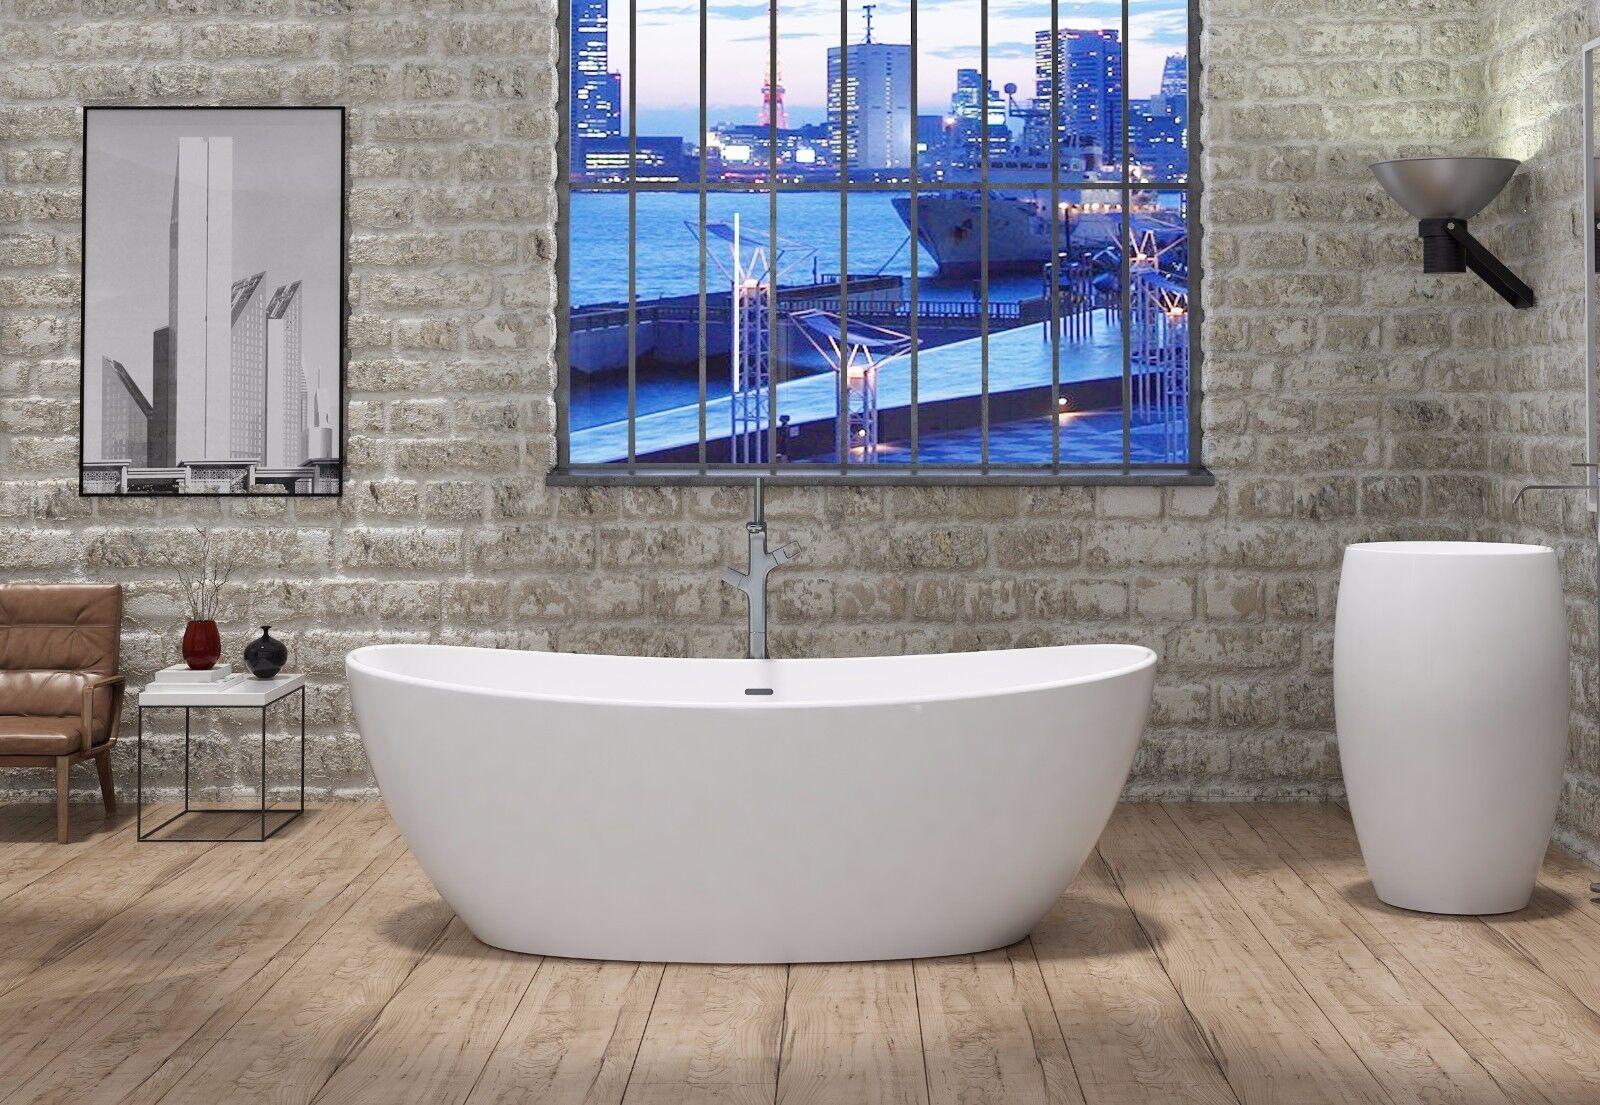 avalon 65 freestanding bathtub solid surface stone